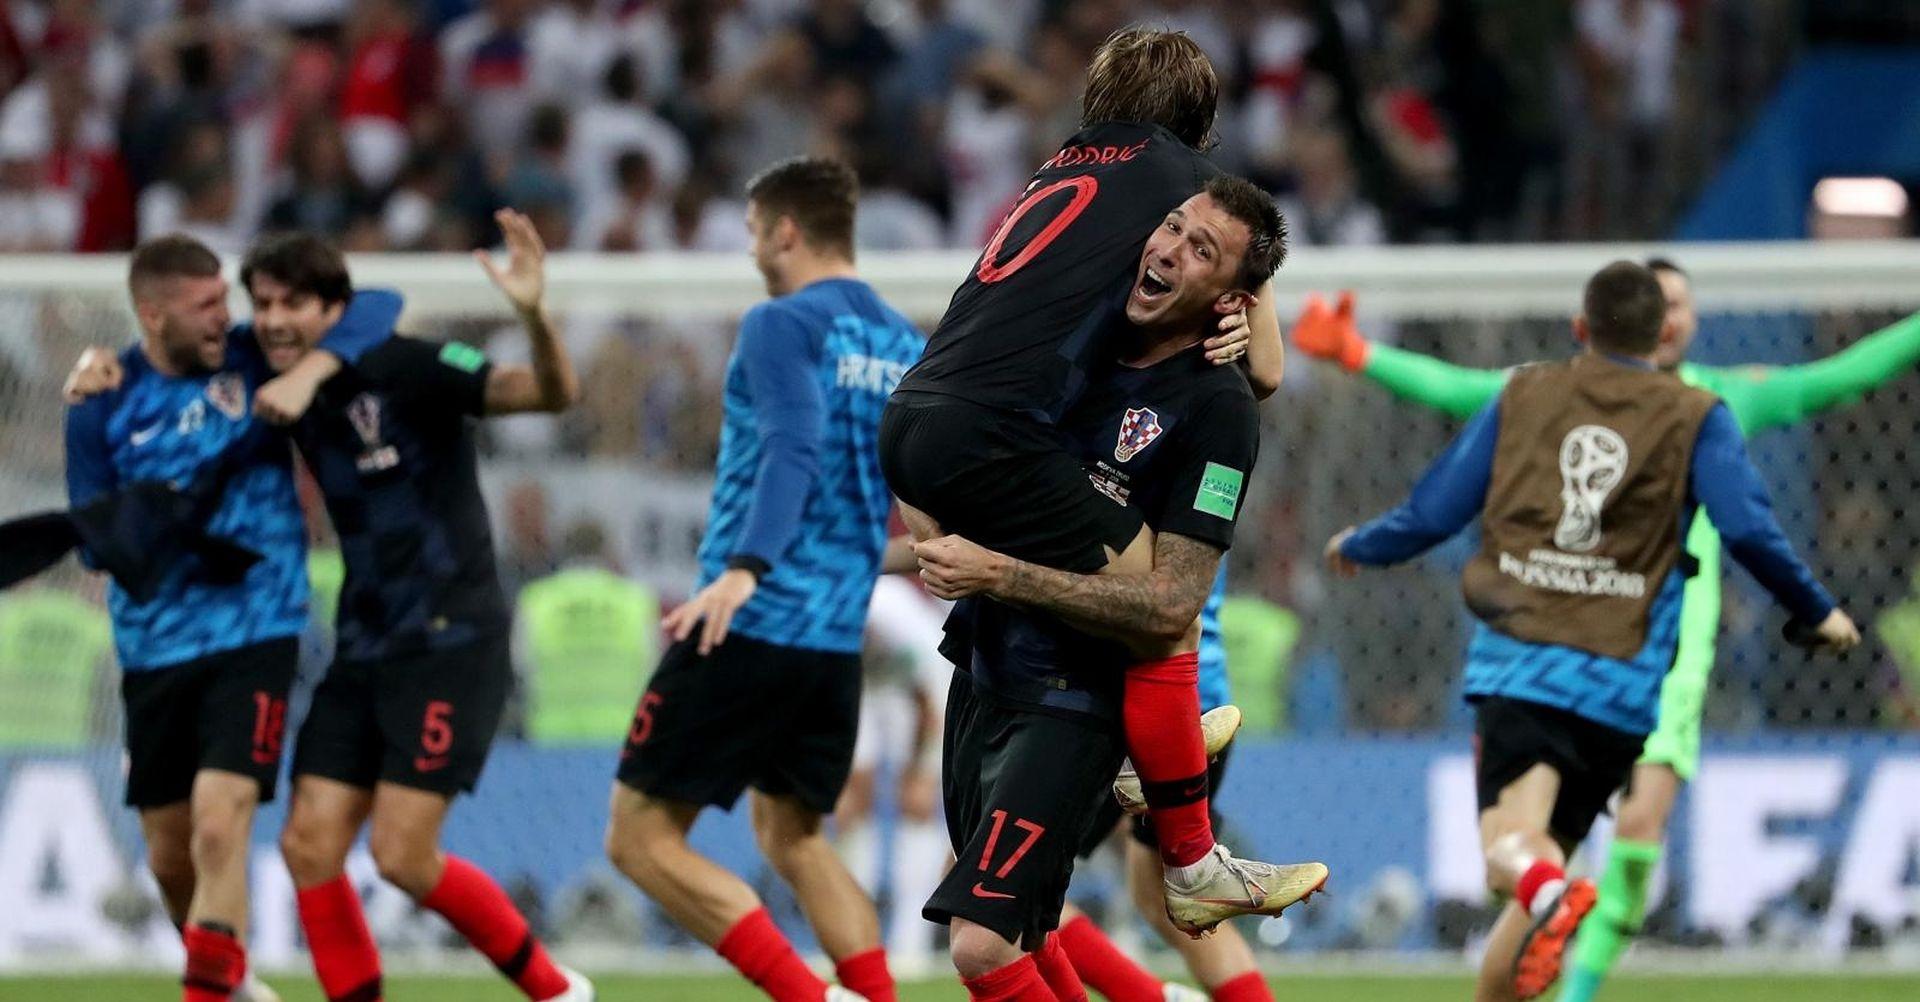 'Vatrenima' drama na Lužnikiju i Wembleyju, Englezi bolji ukupno